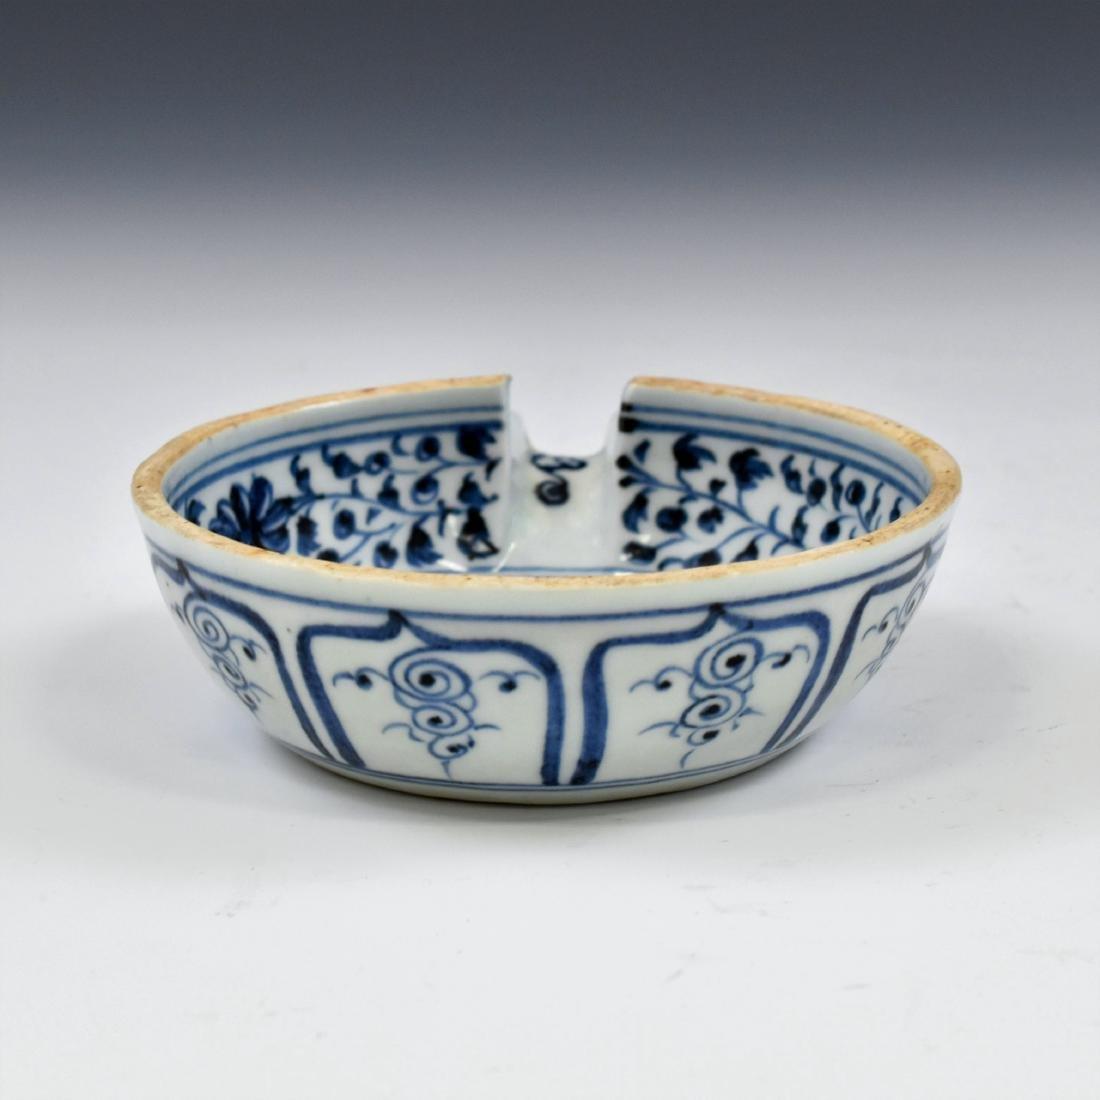 15 TH C YUAN DYNASTY BLUE & WHITE PORCELAIN WATER - 7